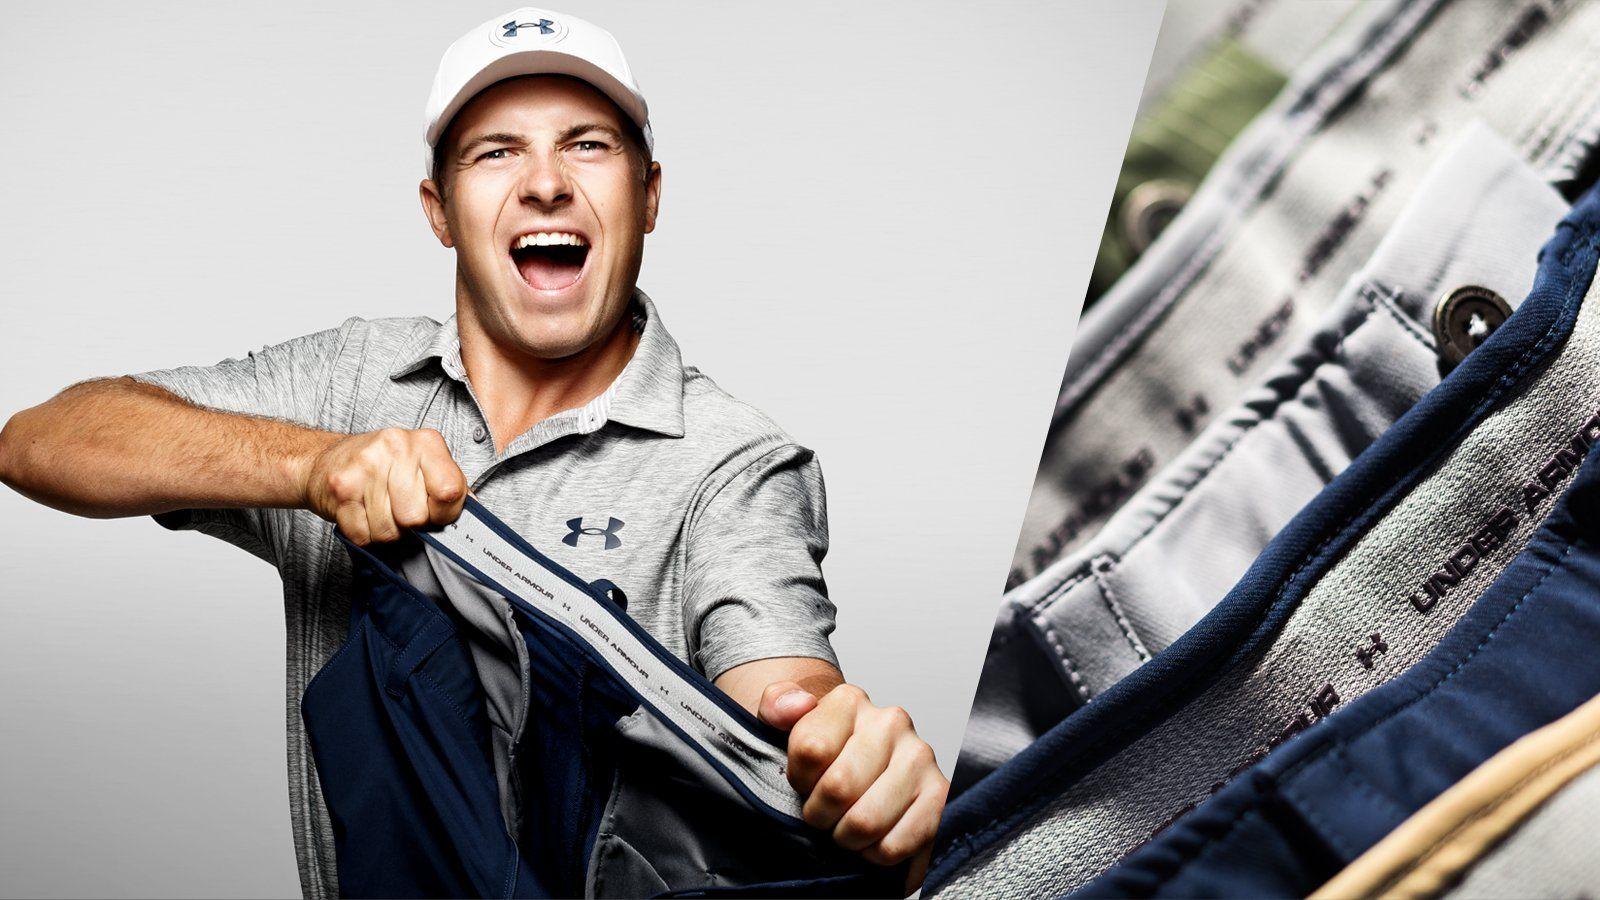 Golf Polo Shirts, Shorts & Gear Jordan spieth, Golf